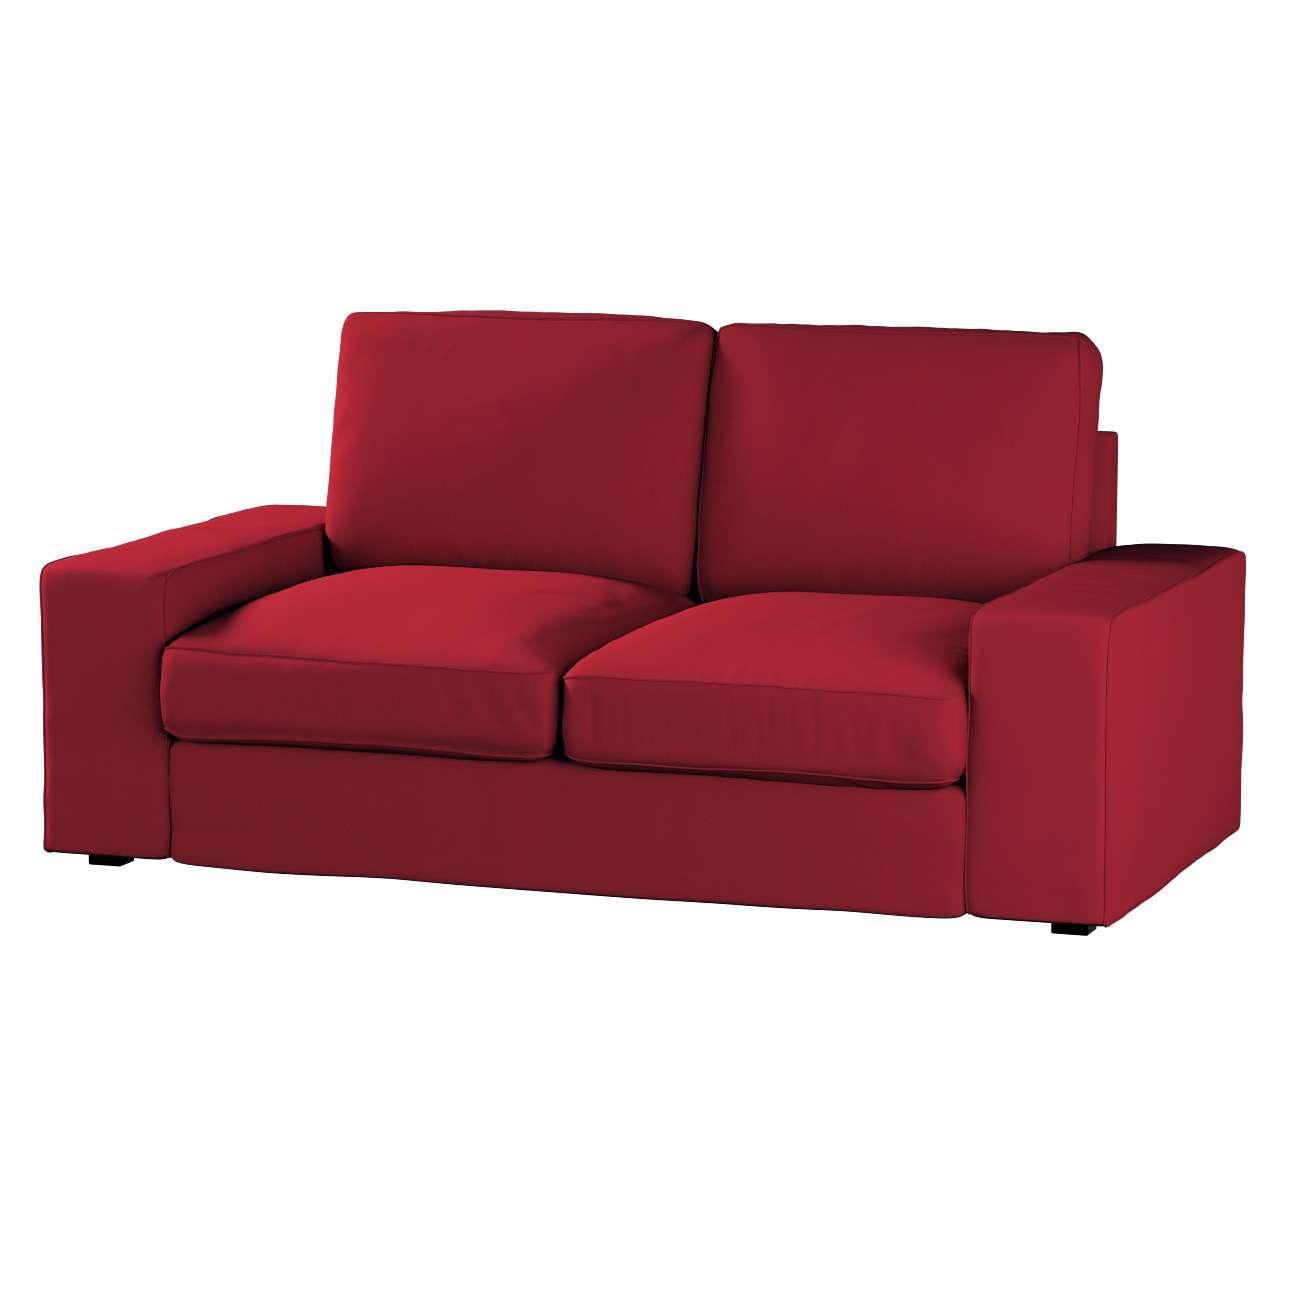 Kivik 2-Sitzer Sofabezug Sofa Kivik 2-Sitzer von der Kollektion Chenille , Stoff: 702-24